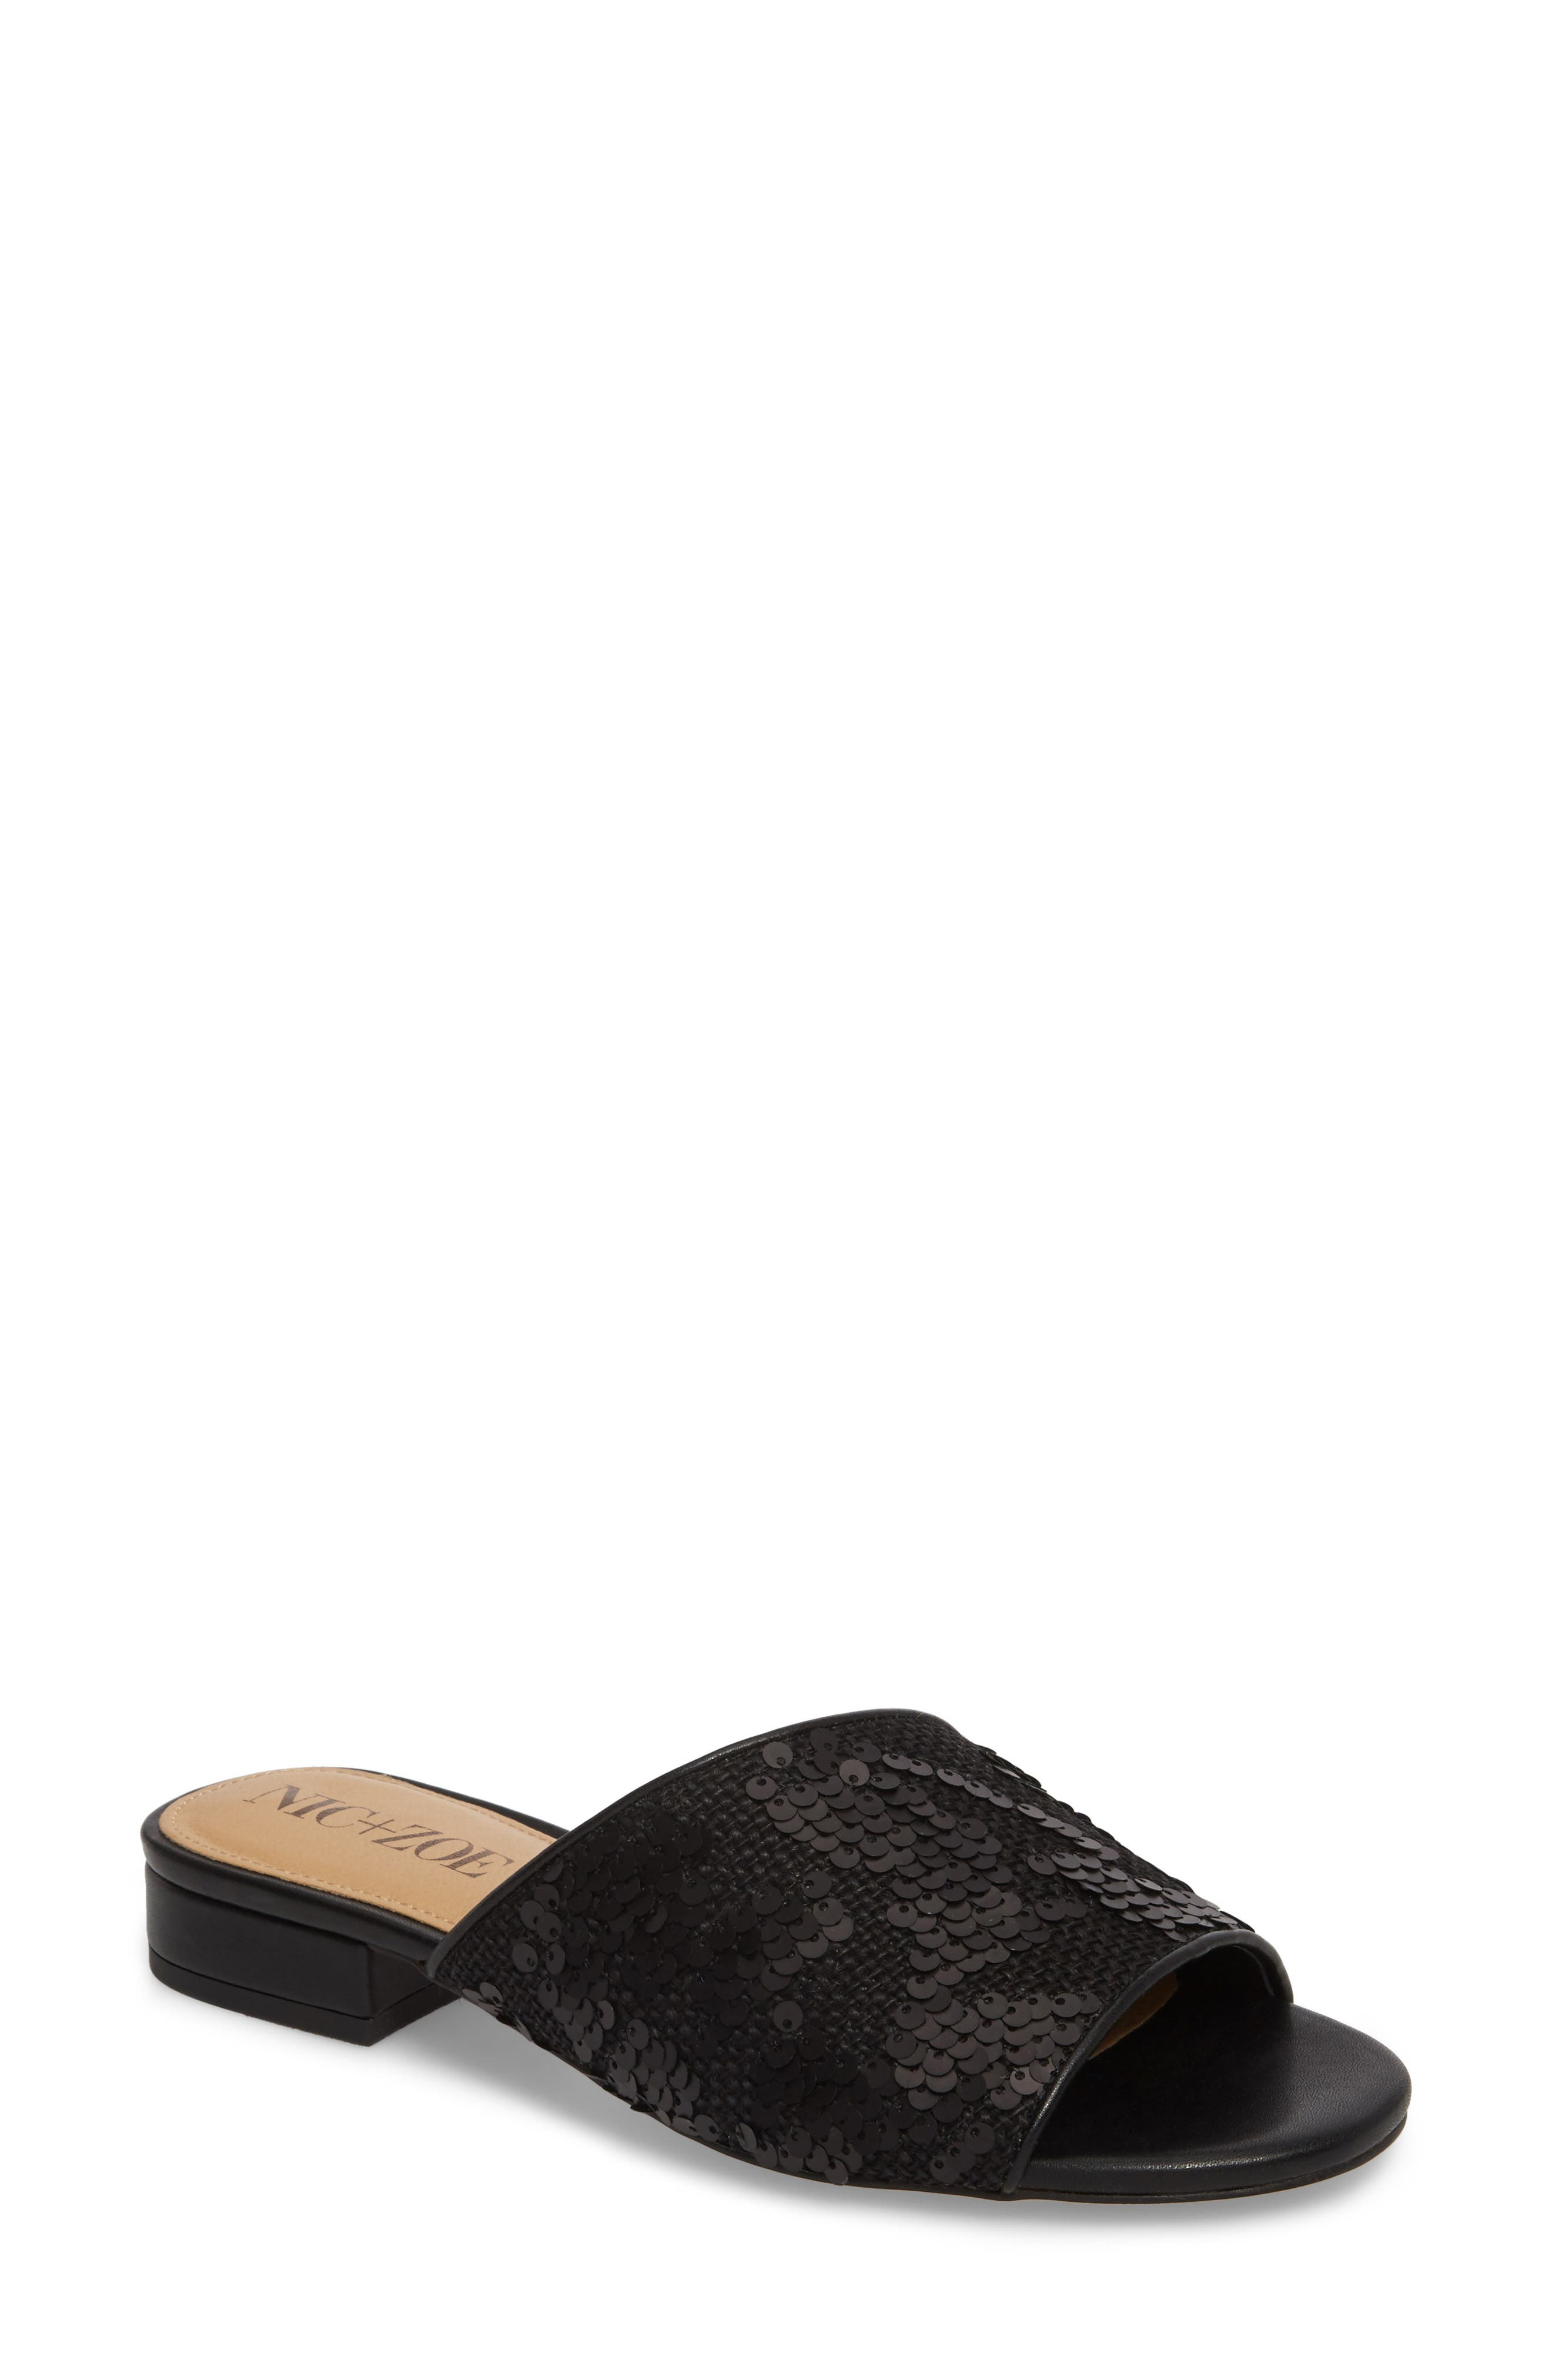 Stella Slide Sandal,                             Main thumbnail 1, color,                             Black Sequin Fabric